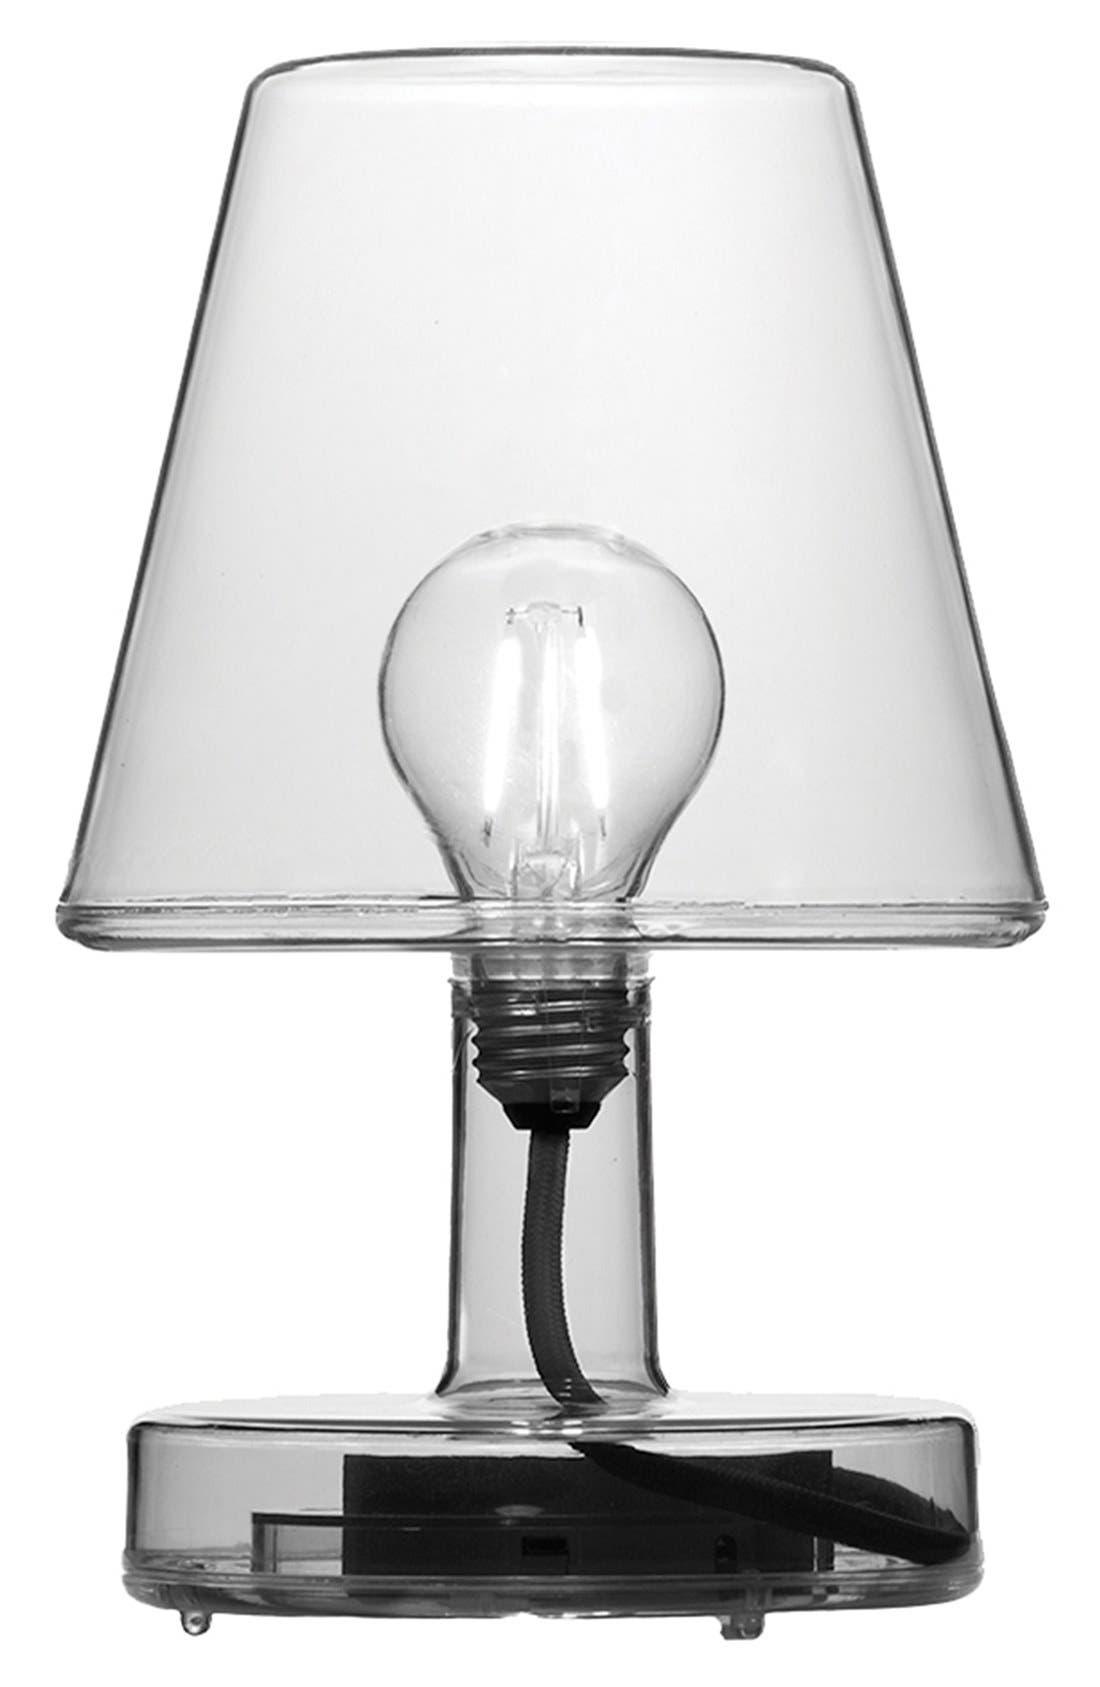 Main Image - Fatboy Transloetje Lamp